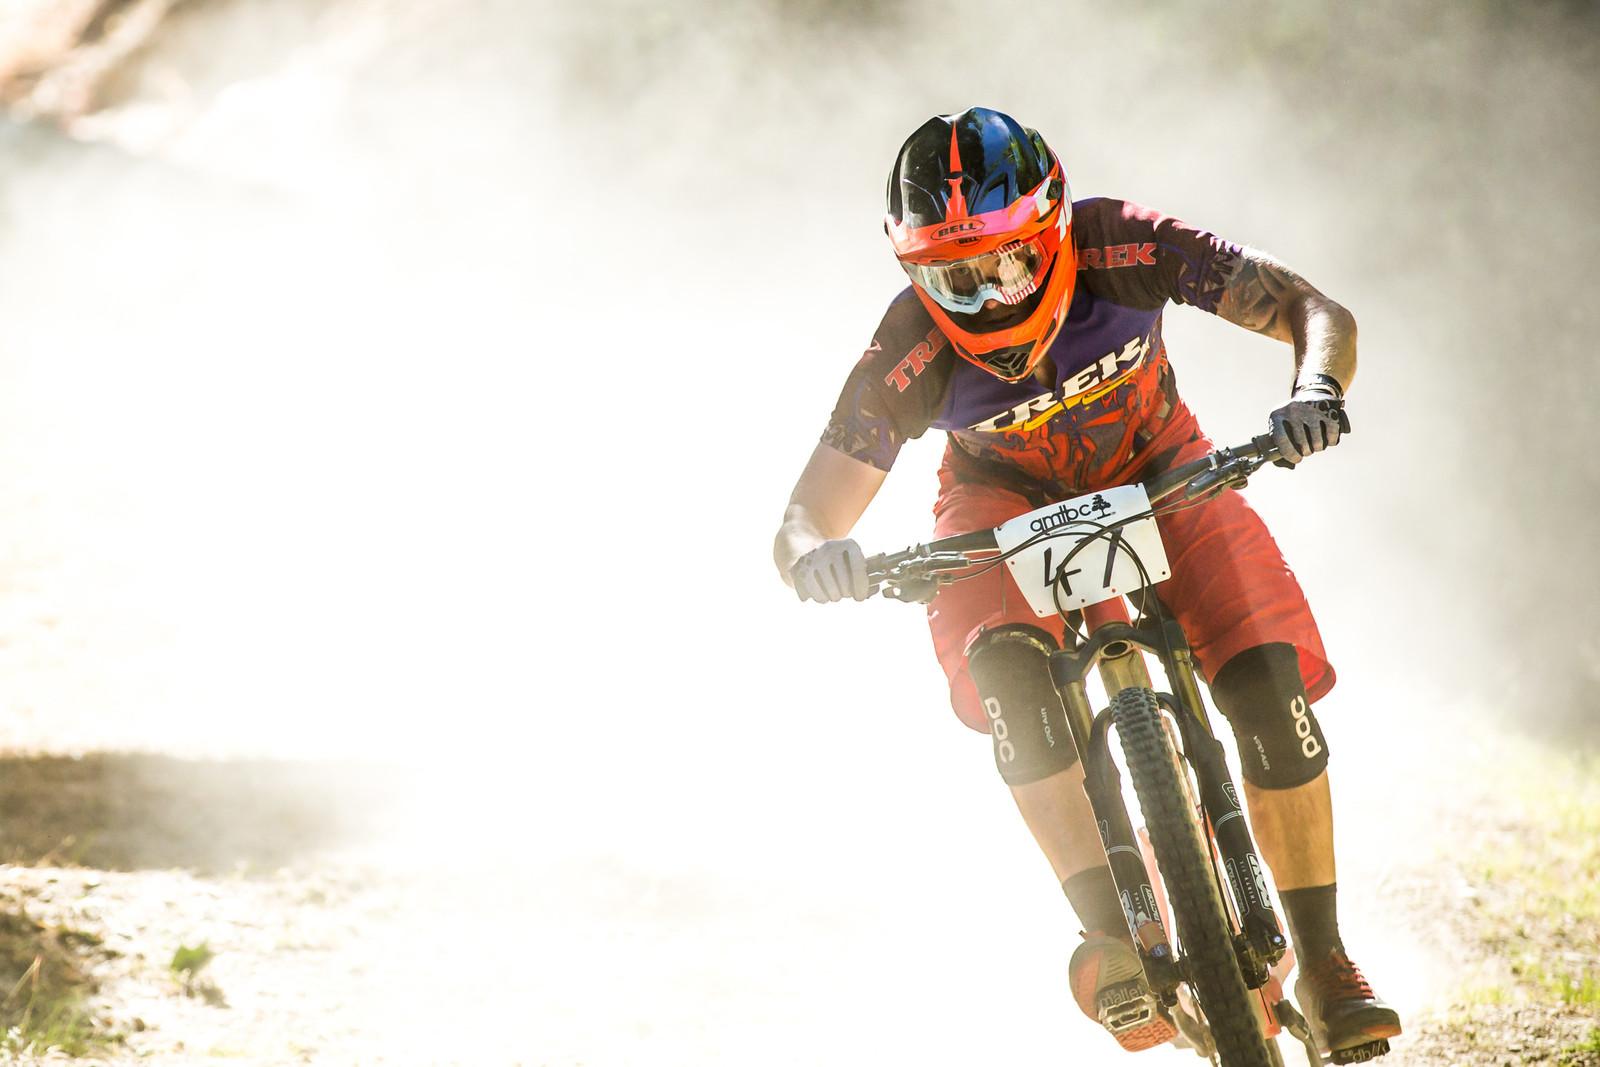 Tom Lamb - Homegrown NZ Downhill - Vertigo Bikes Ride More DH Series Race 1 - Mountain Biking Pictures - Vital MTB